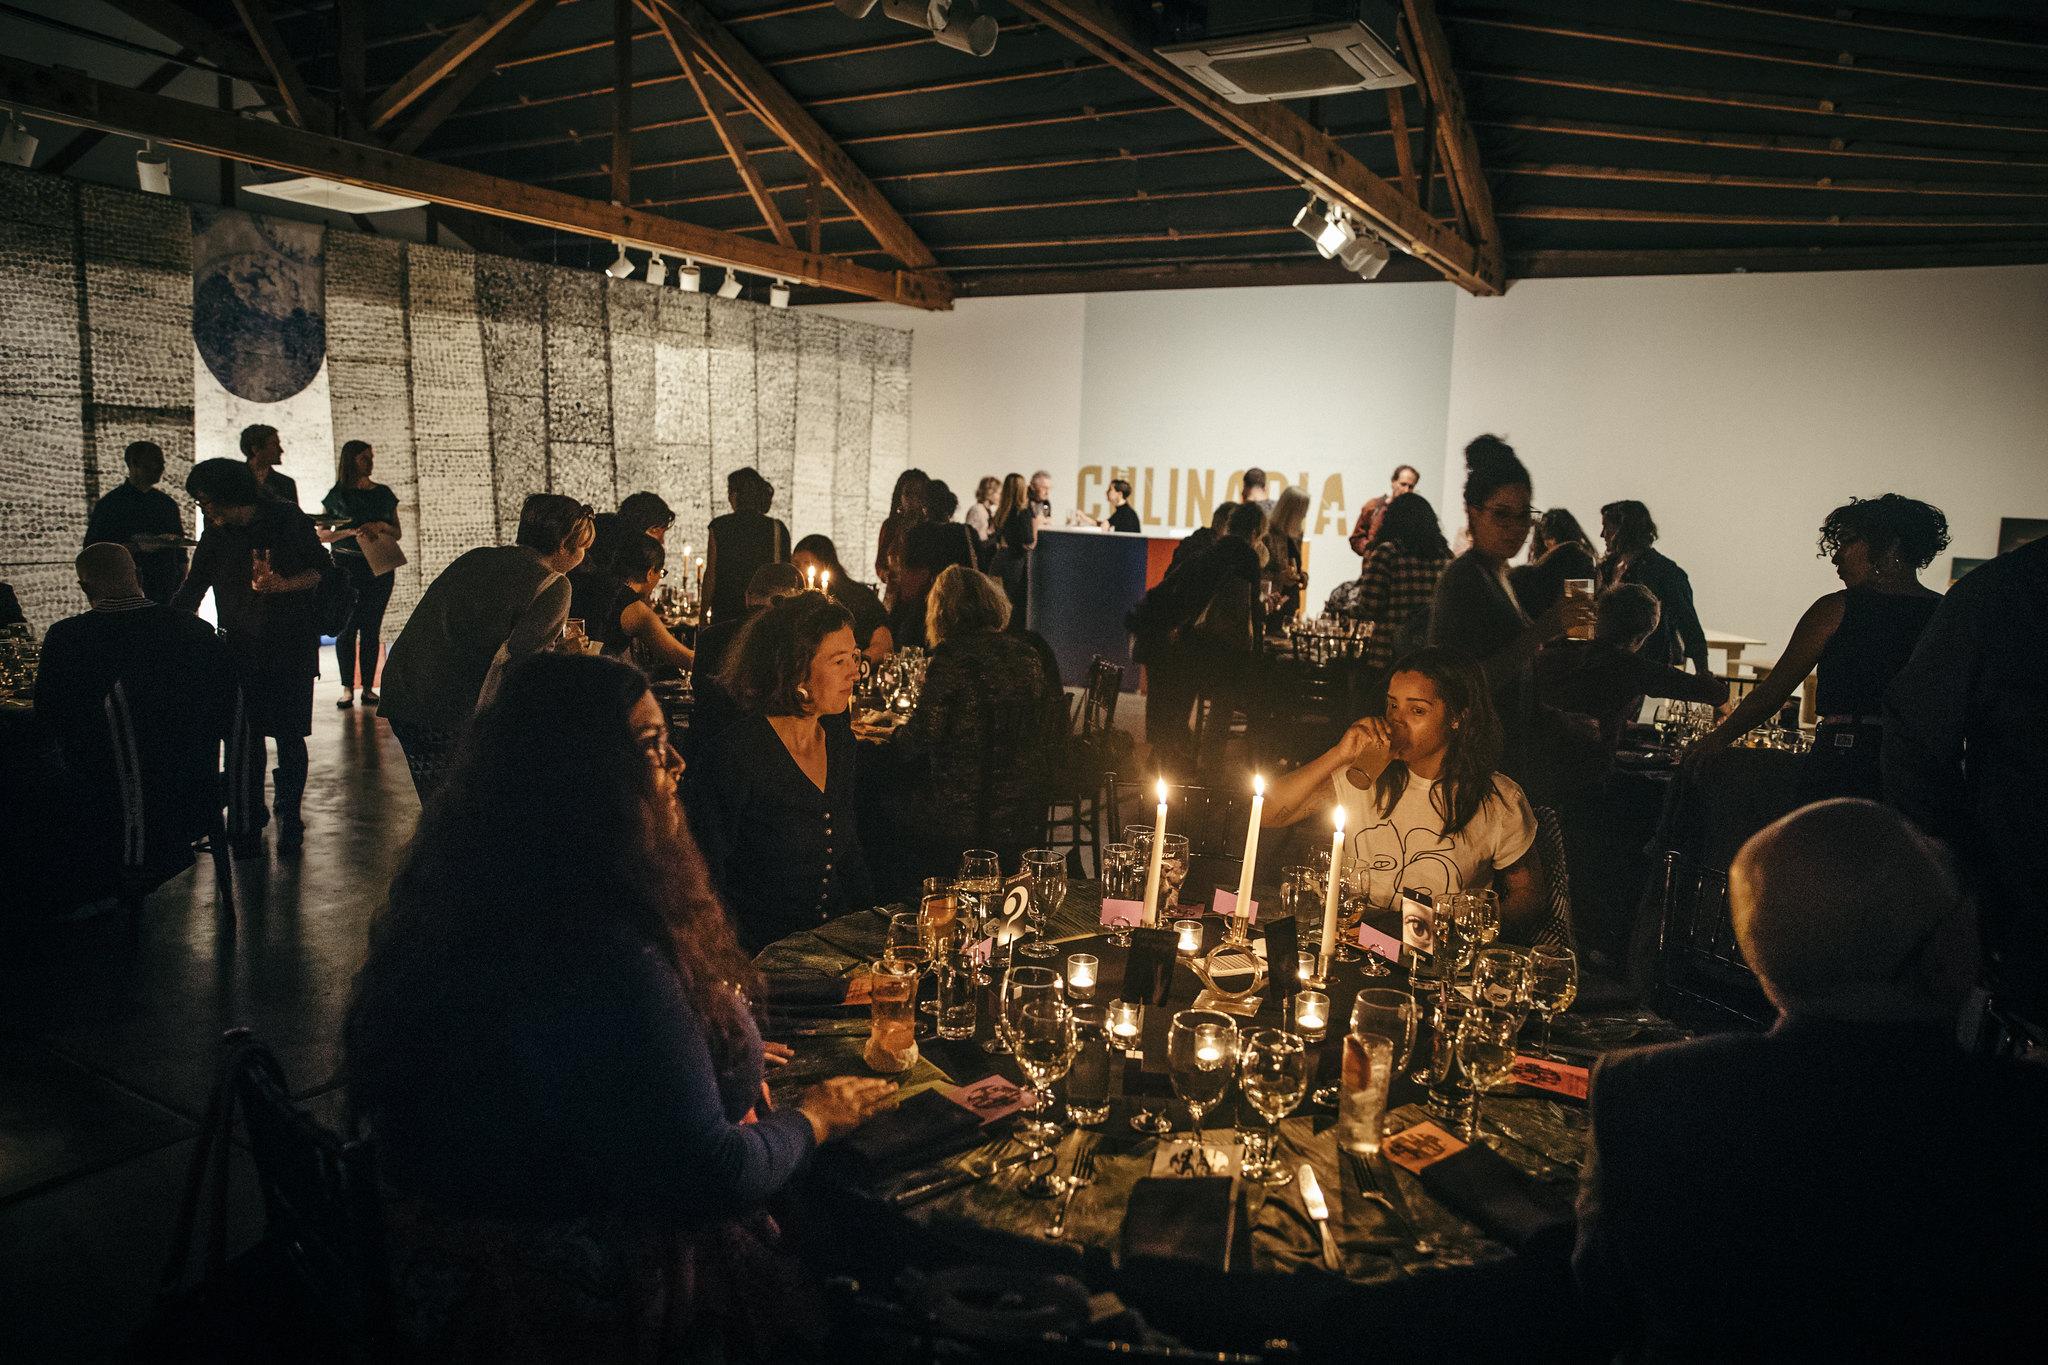 Culinaria: Fernanda D'Agostino and Carlo LaMagna (Clyde Common, Magna) -